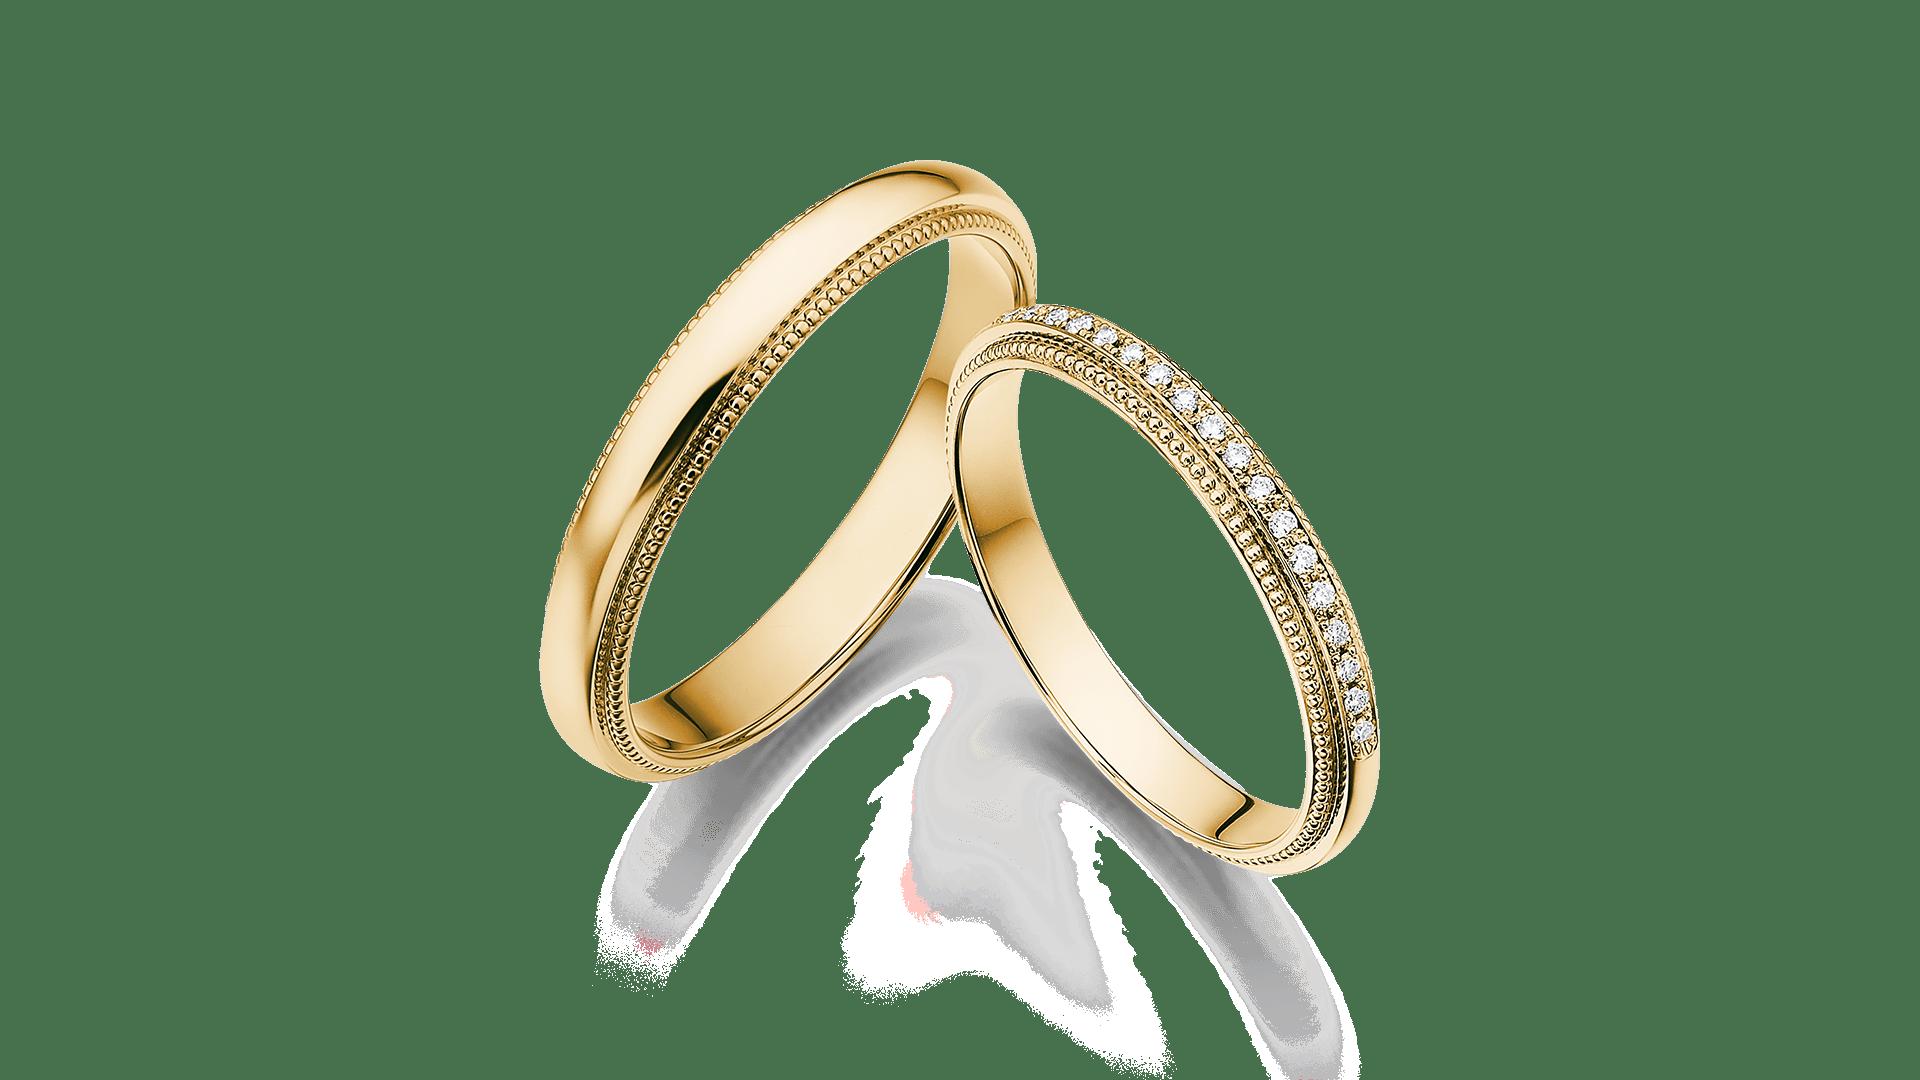 helios DR18 ヘリオスDR18   結婚指輪サムネイル 2